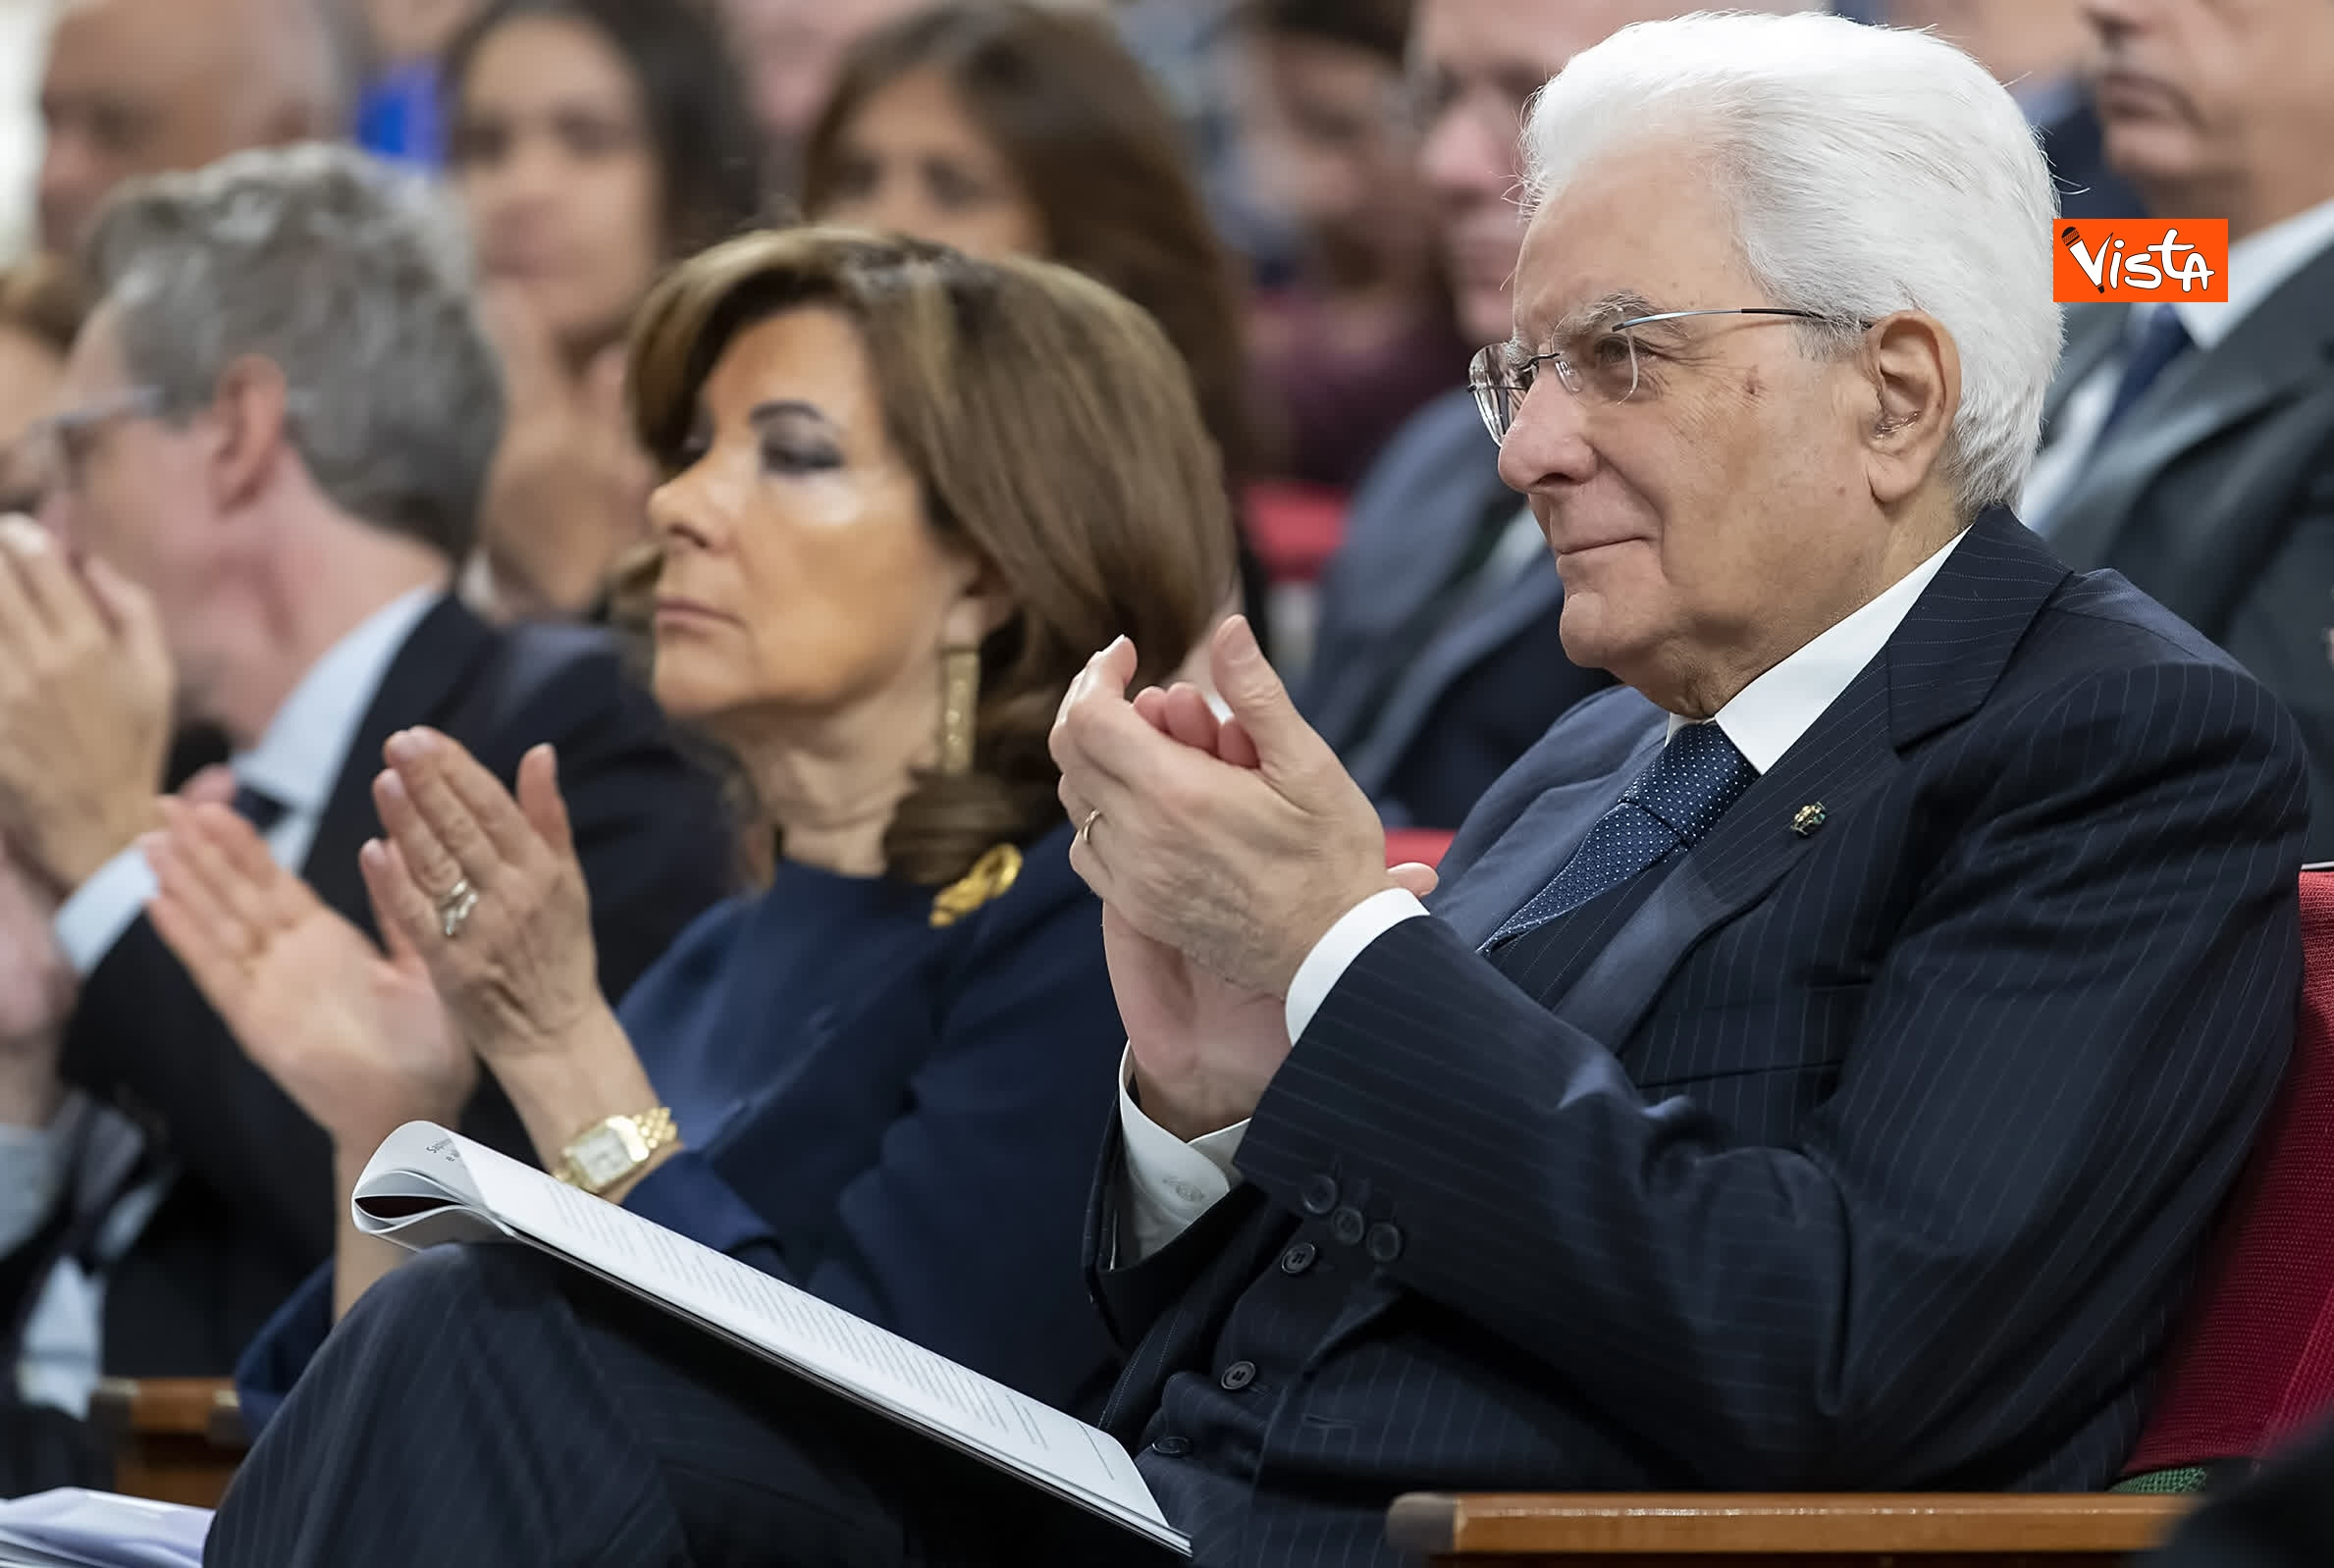 17-02-20 Segre riceve laurea honoris causa dal rettore della Sapienza Gaudio_02